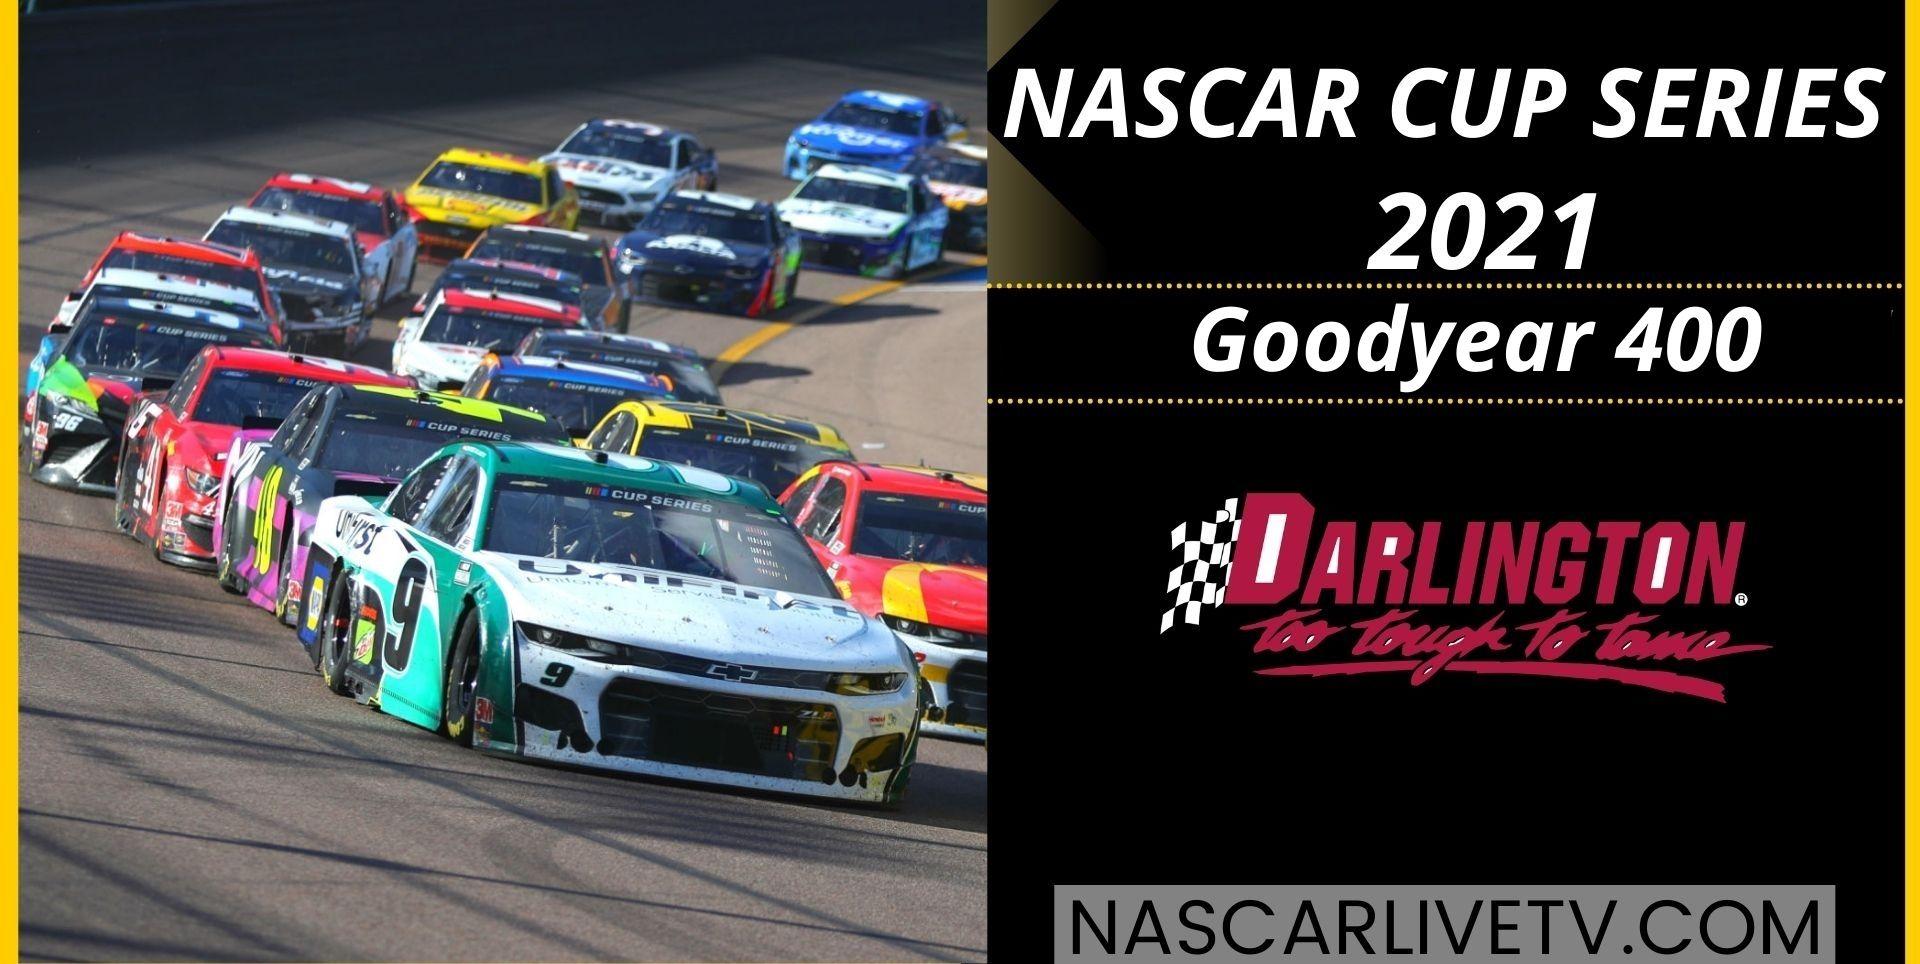 NASCAR Cup Series Goodyear 400 Darlington Live Stream